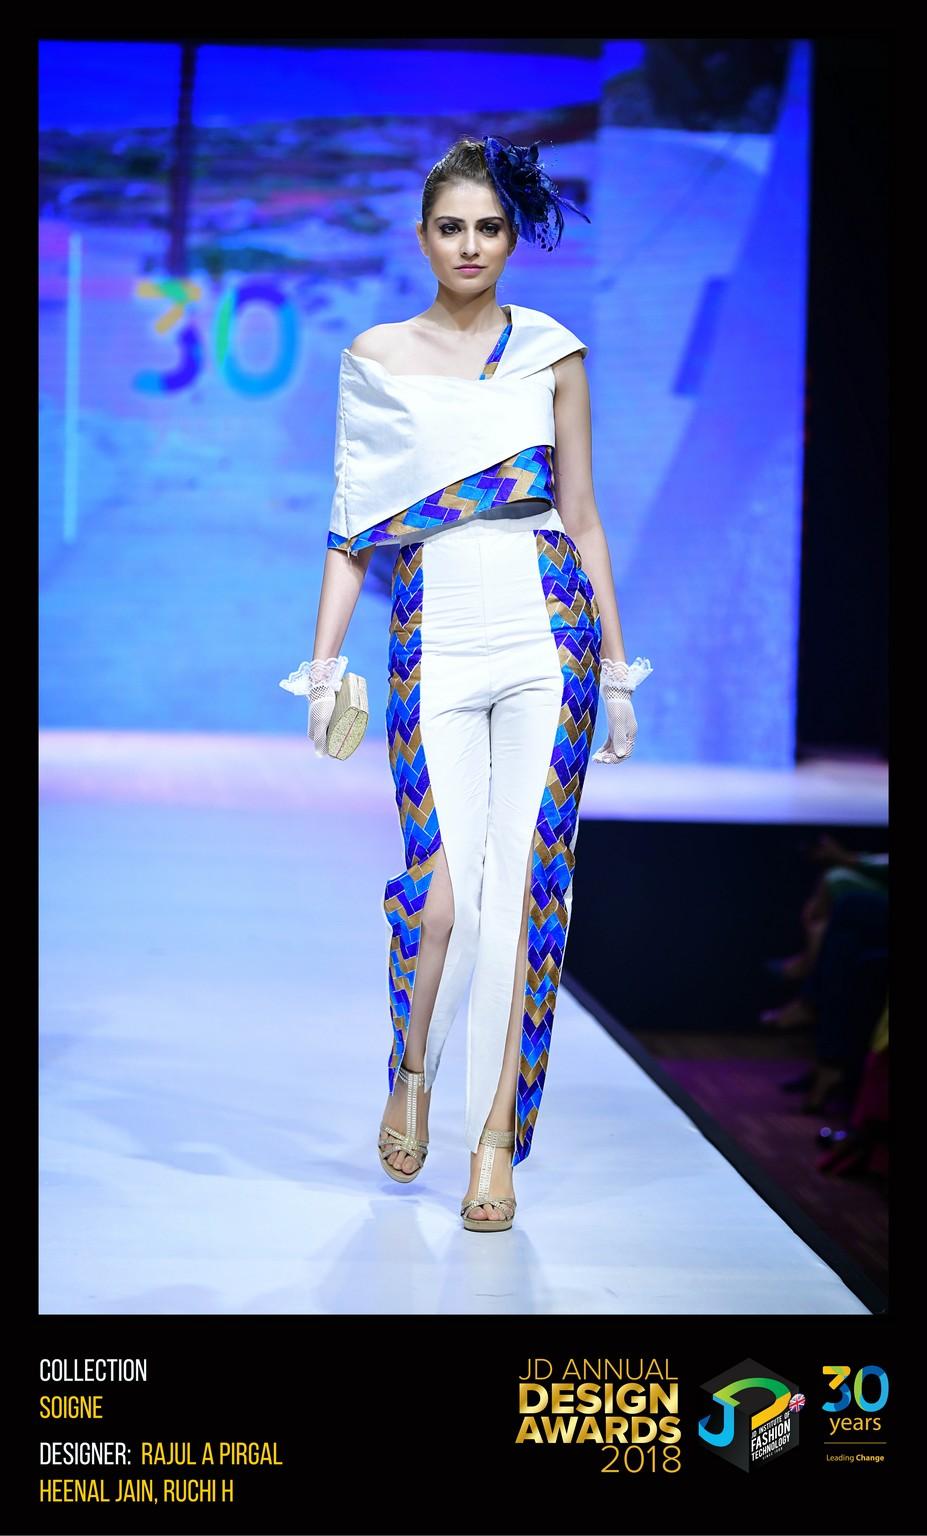 Soigne – Change – JD Annual Design Awards 2018 | Designer: Rajul, Heena and Ruchi | Photography : Jerin Nath (@jerin_nath) soigne – change – jd annual design awards 2018 - SOIGNE 5 - Soigne – Change – JD Annual Design Awards 2018